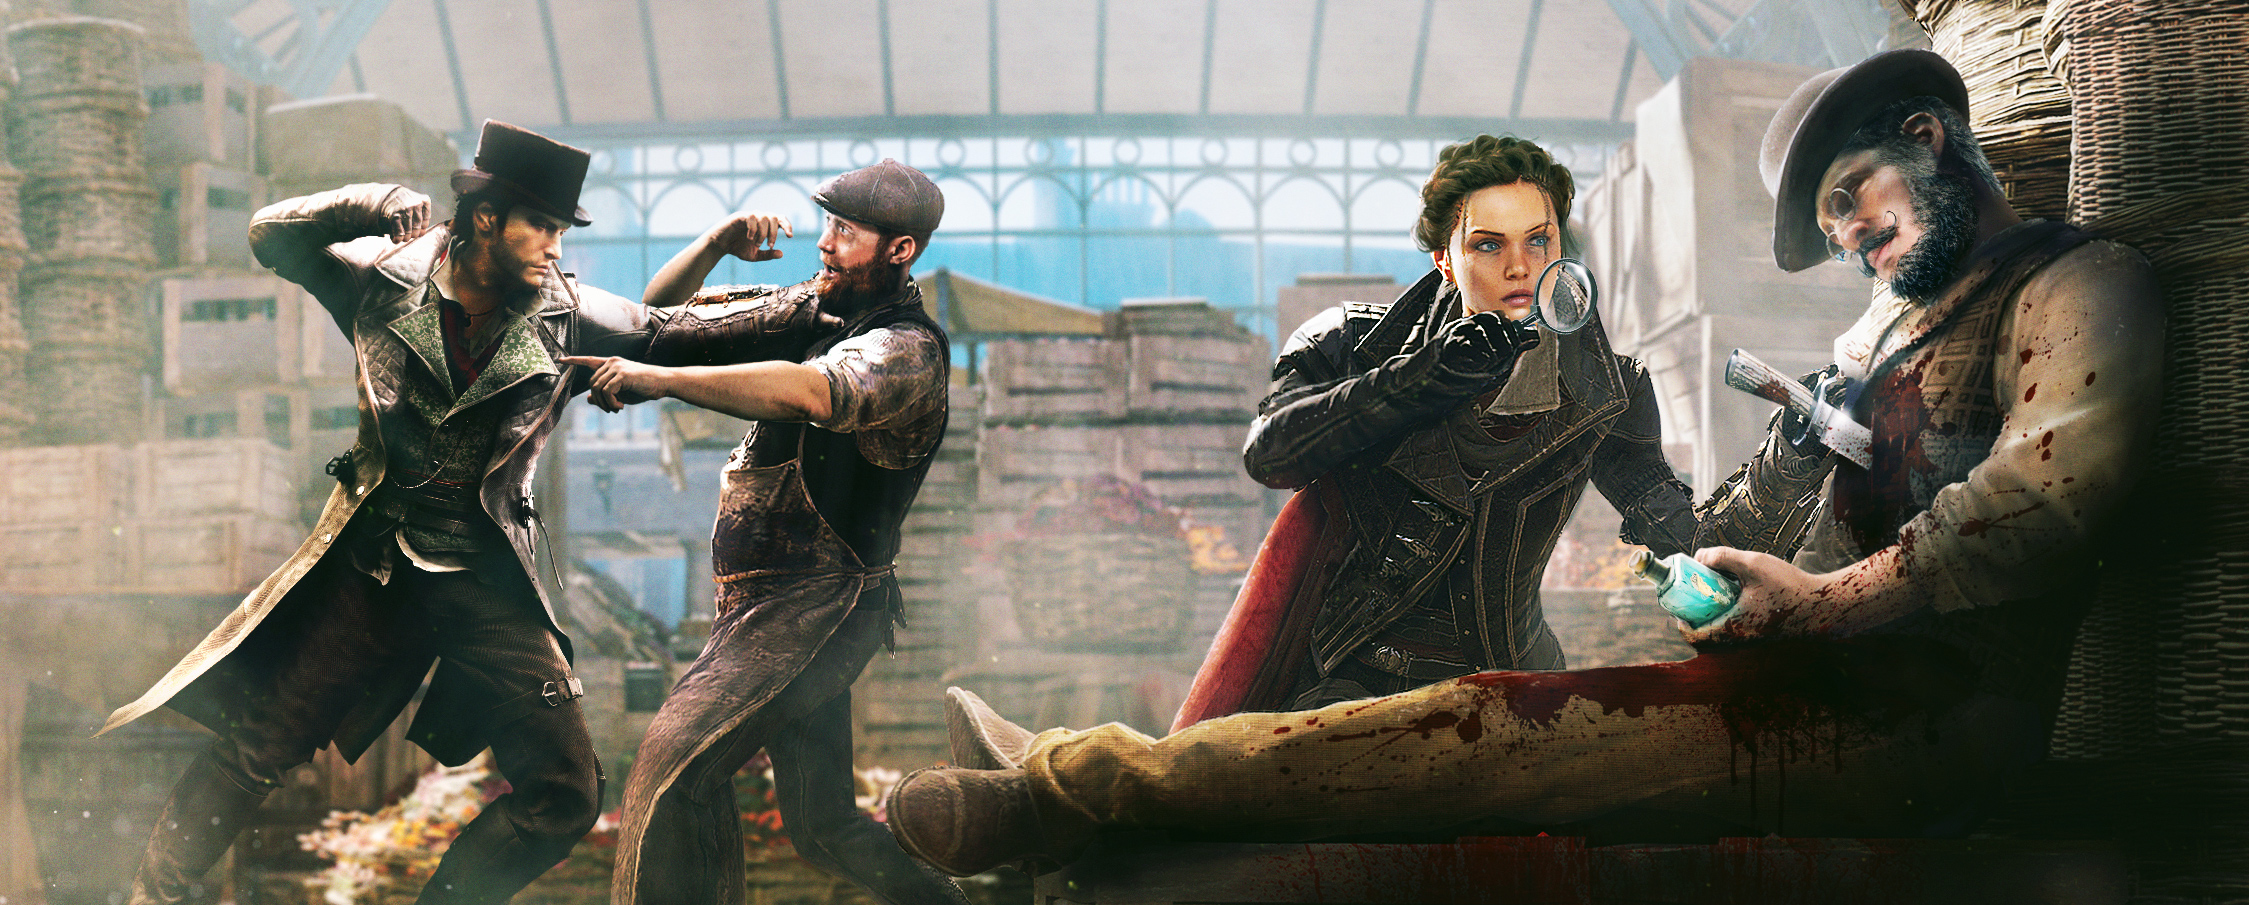 The Dreadful Crimes   Assassin's Creed Wiki   Fandom